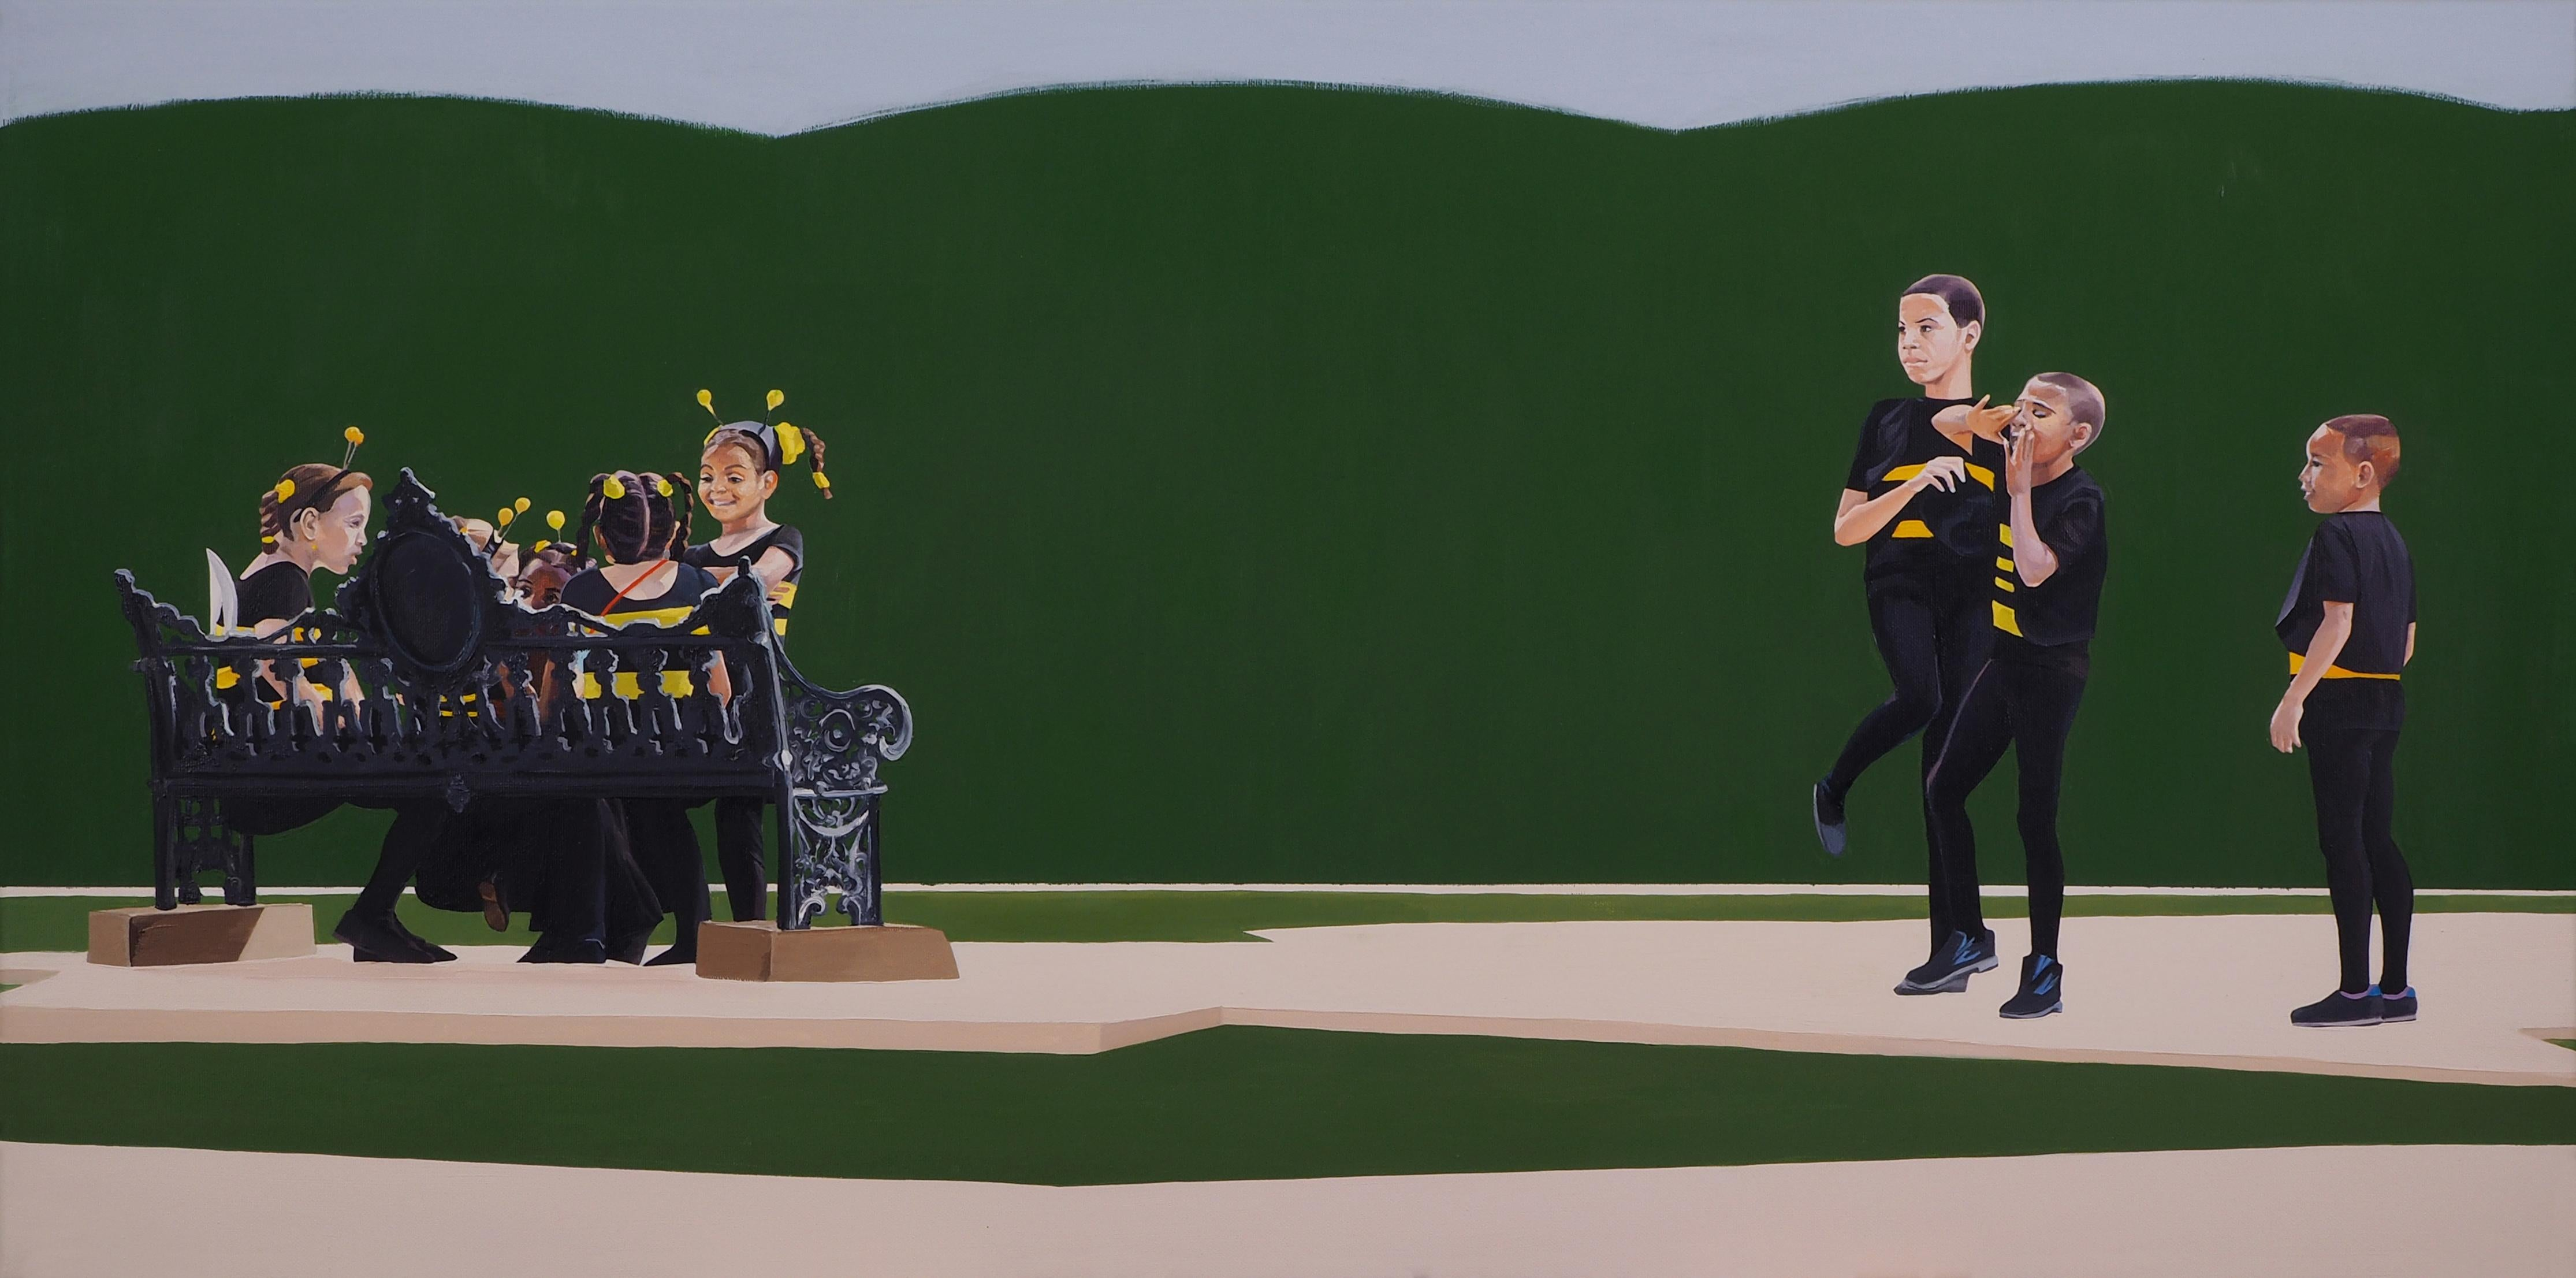 Bees - Modern Figurative, Photorealistic Oil Painting, Children, Realism, Joyful